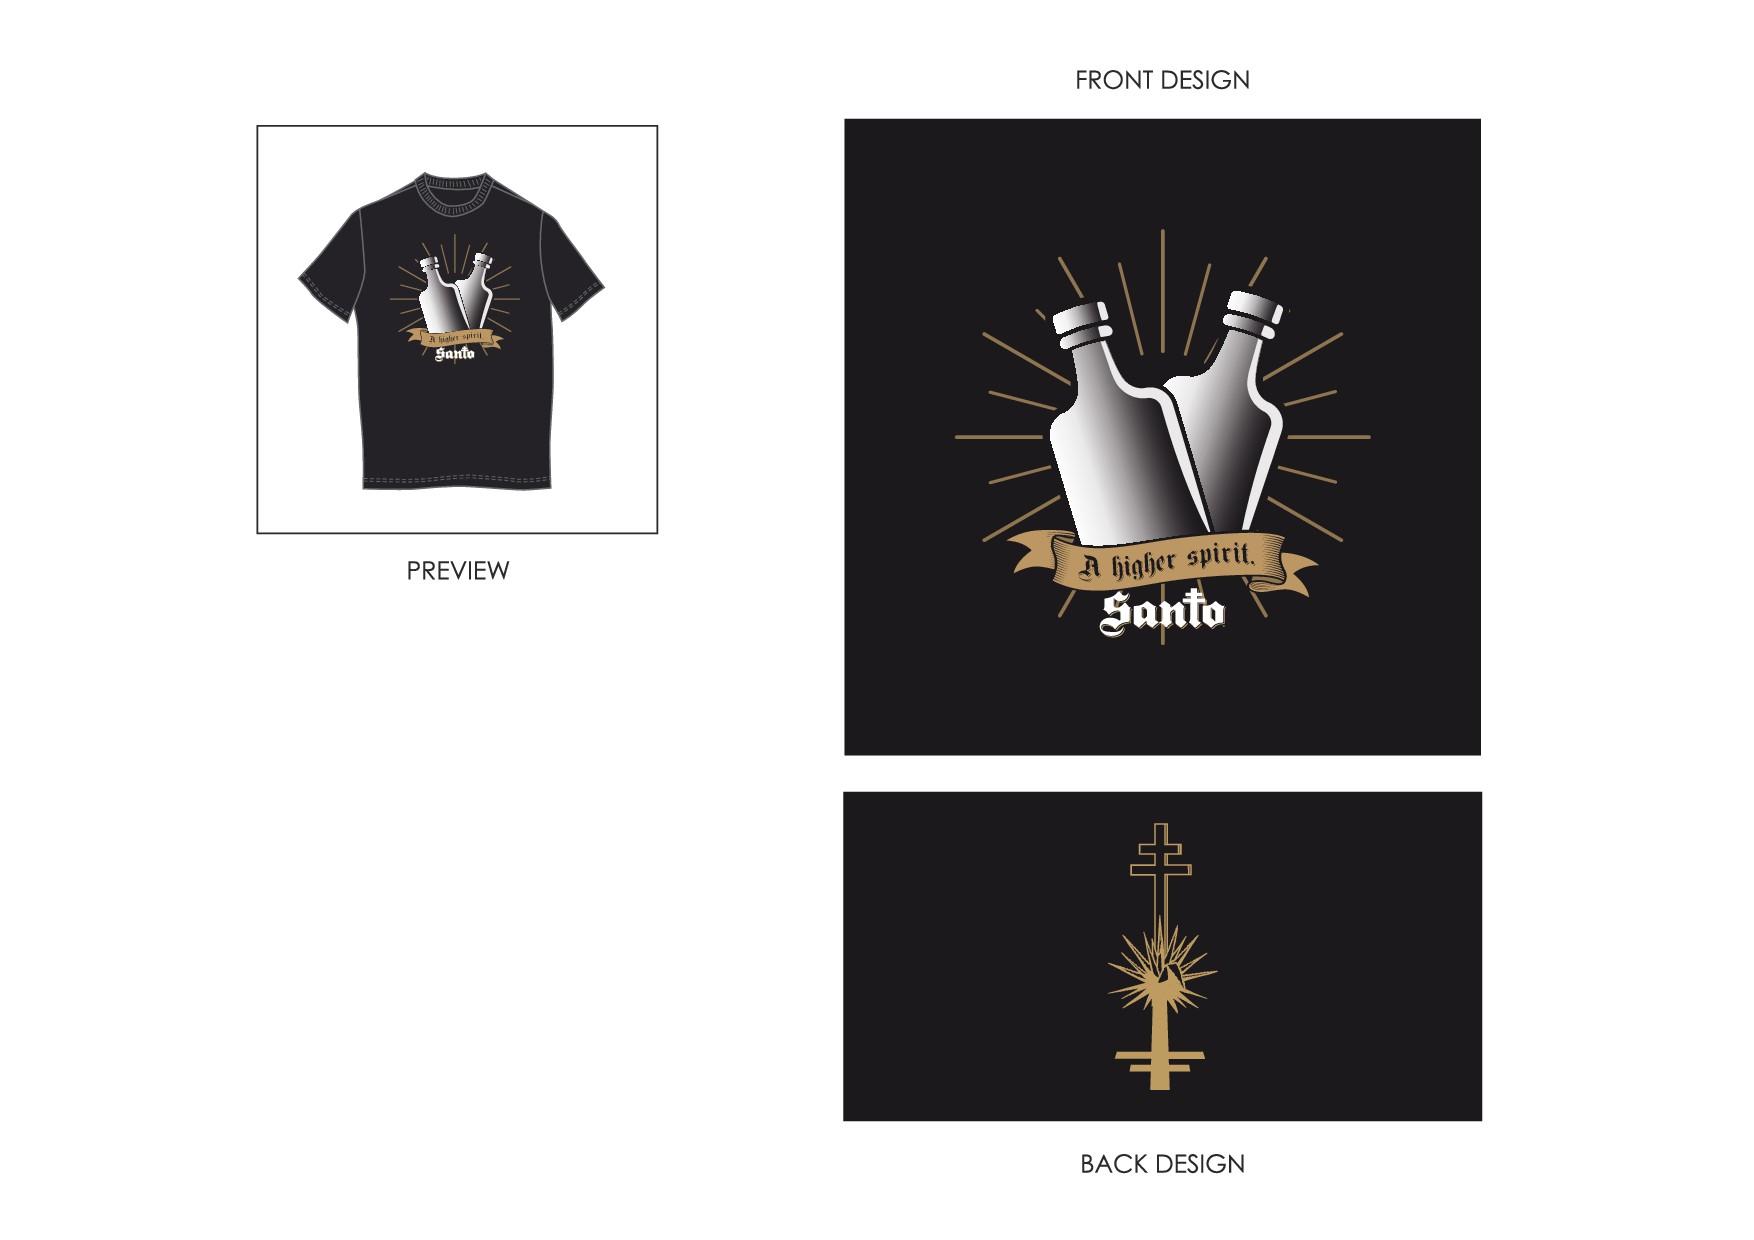 Santo Tequila (Guy Fieri + Sammy Hagar) t-shirt contest